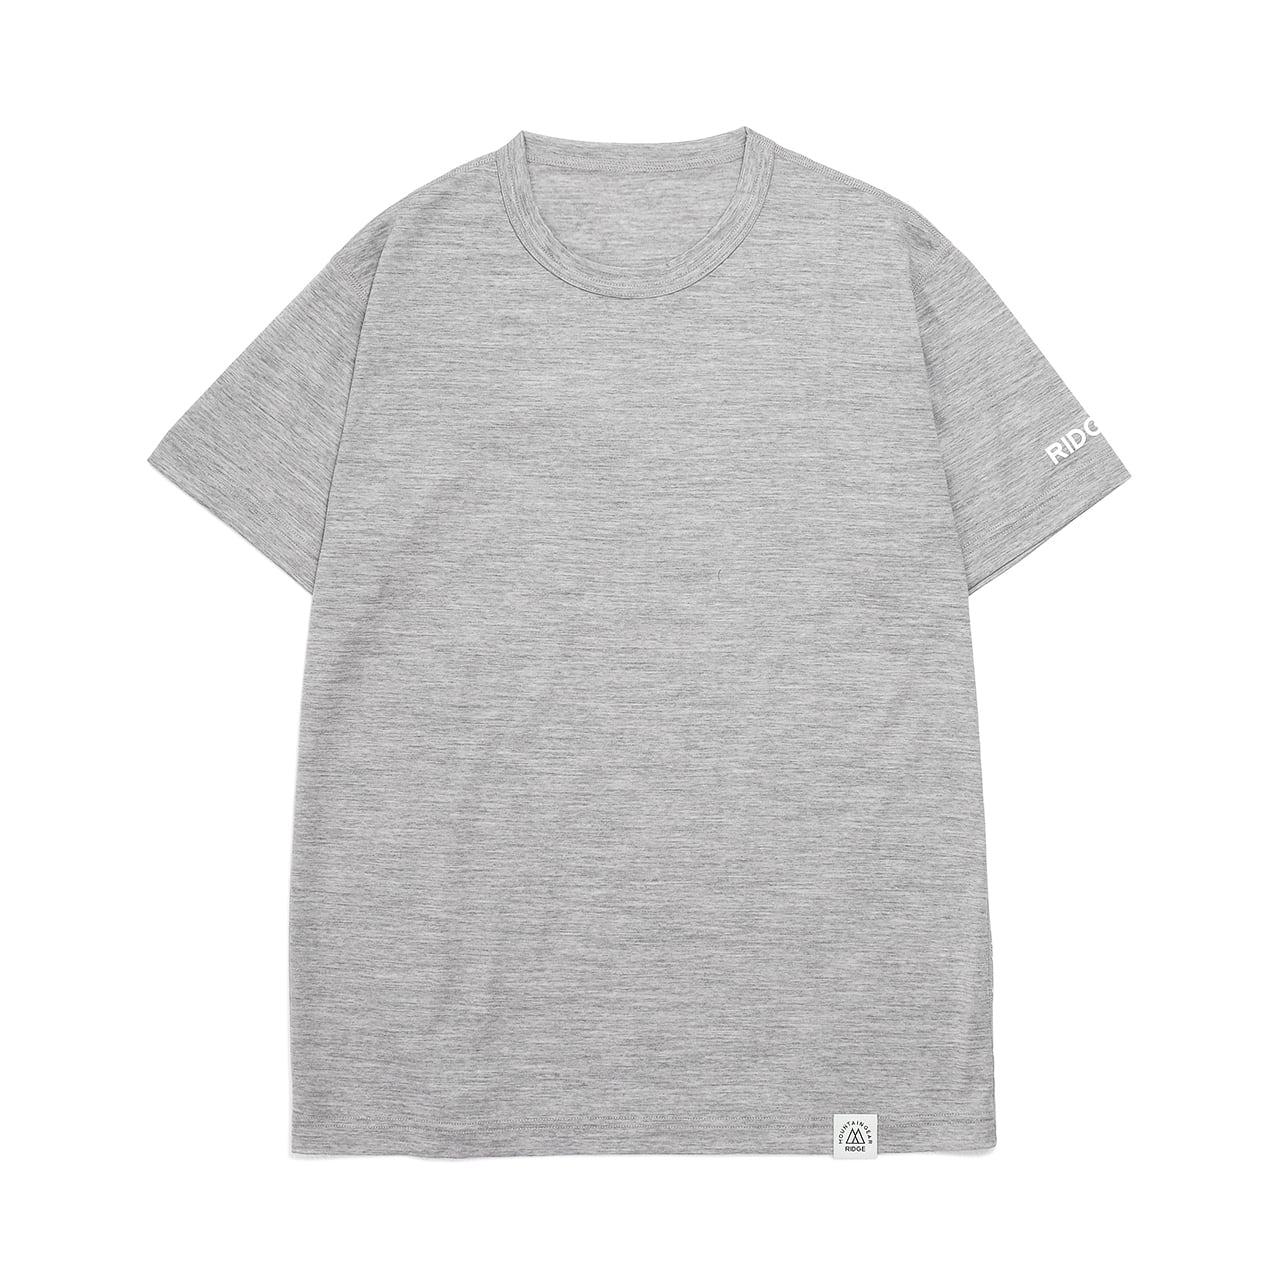 Merino Basic Tee Short Sleeve